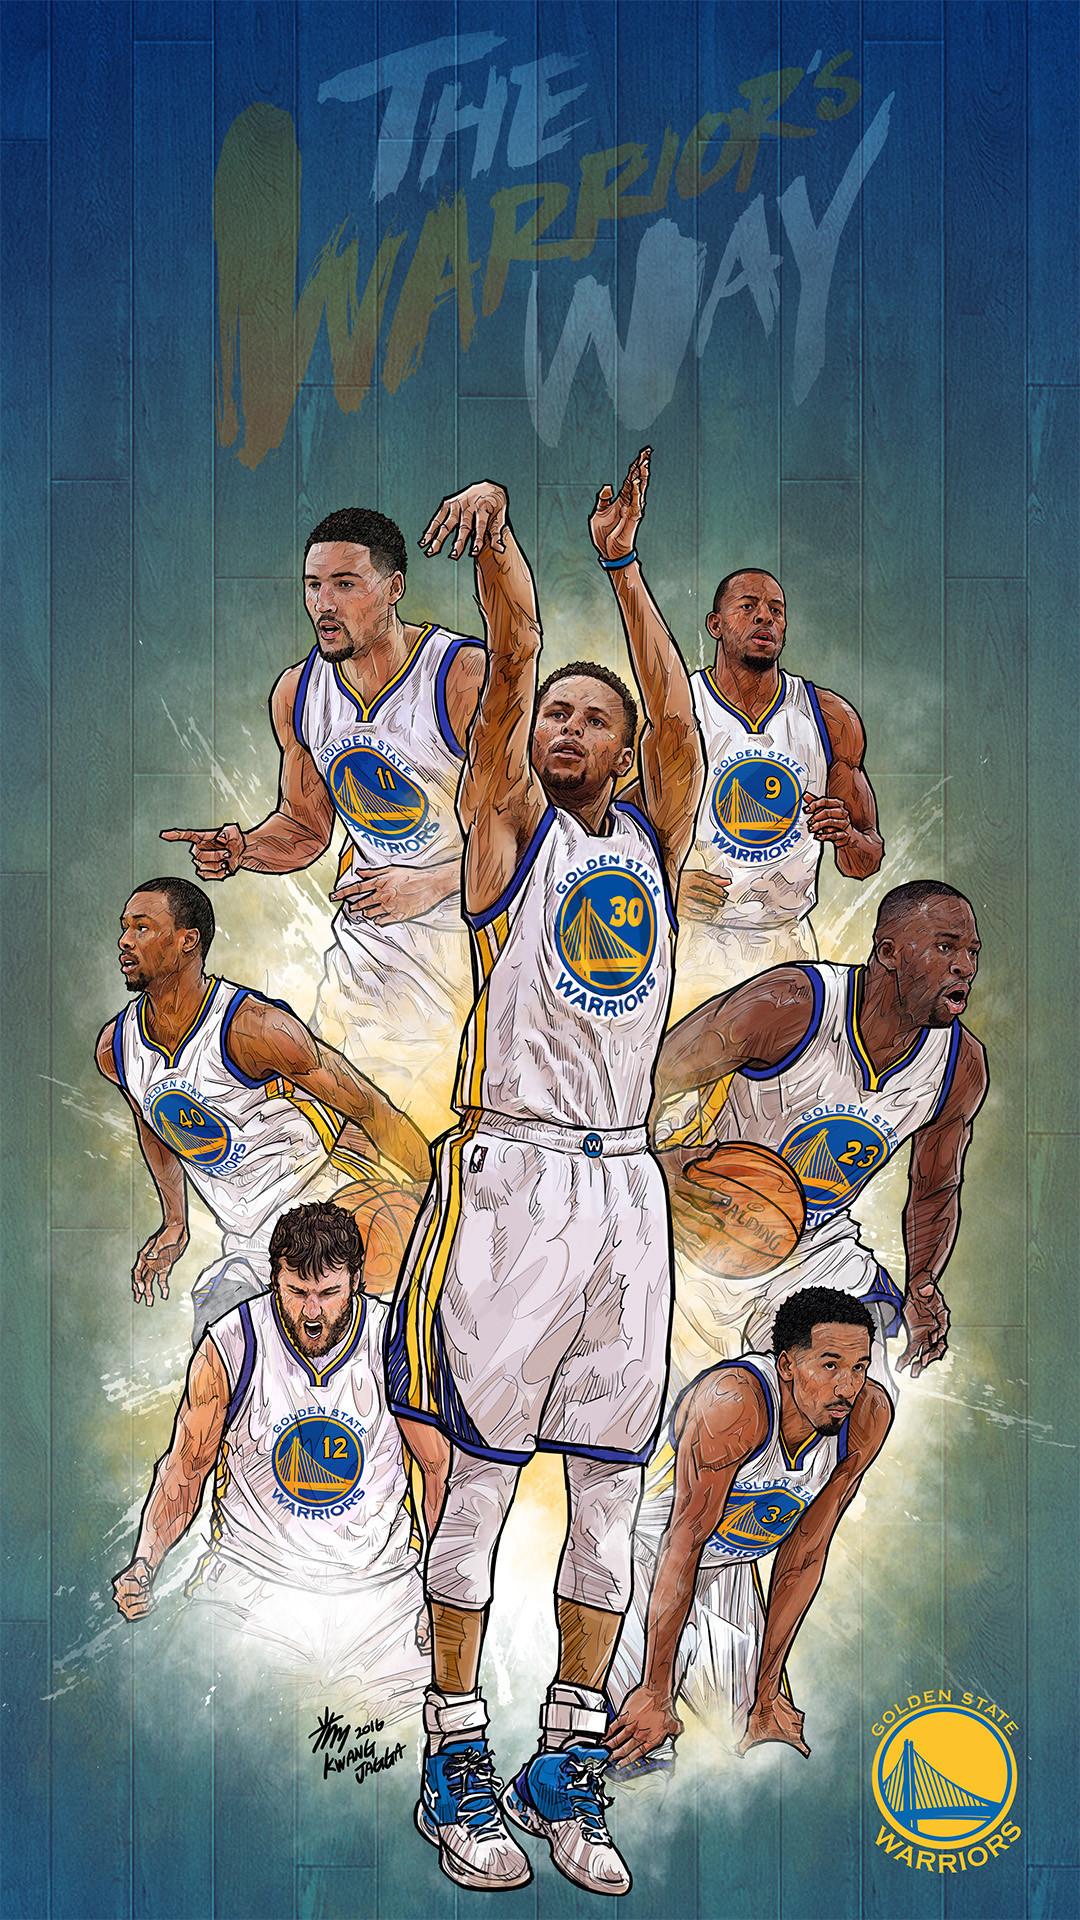 Best 25+ Stephen curry wallpaper hd ideas on Pinterest   Gsw warriors, Curry  wallpaper and Gsw nba